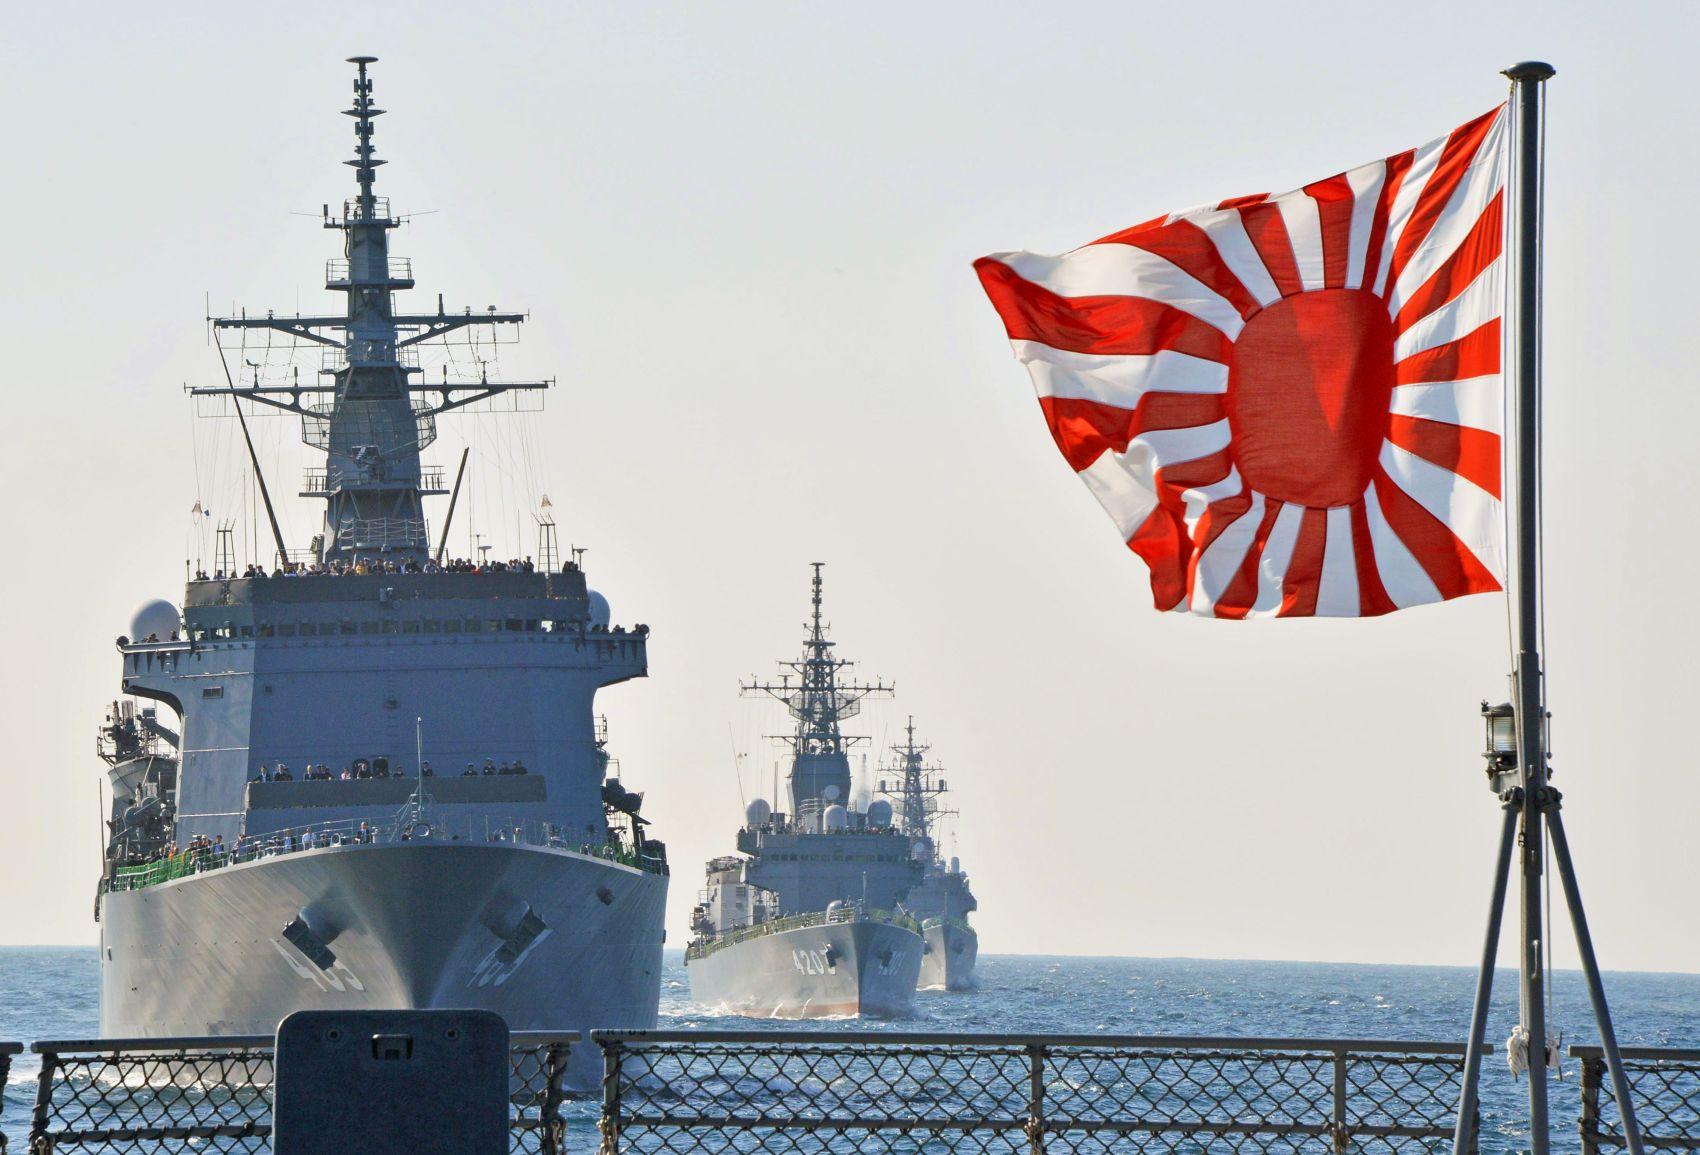 Japan to Hoist 'Rising Sun Flag' in International Fleet Review Despite South Korea's Protests